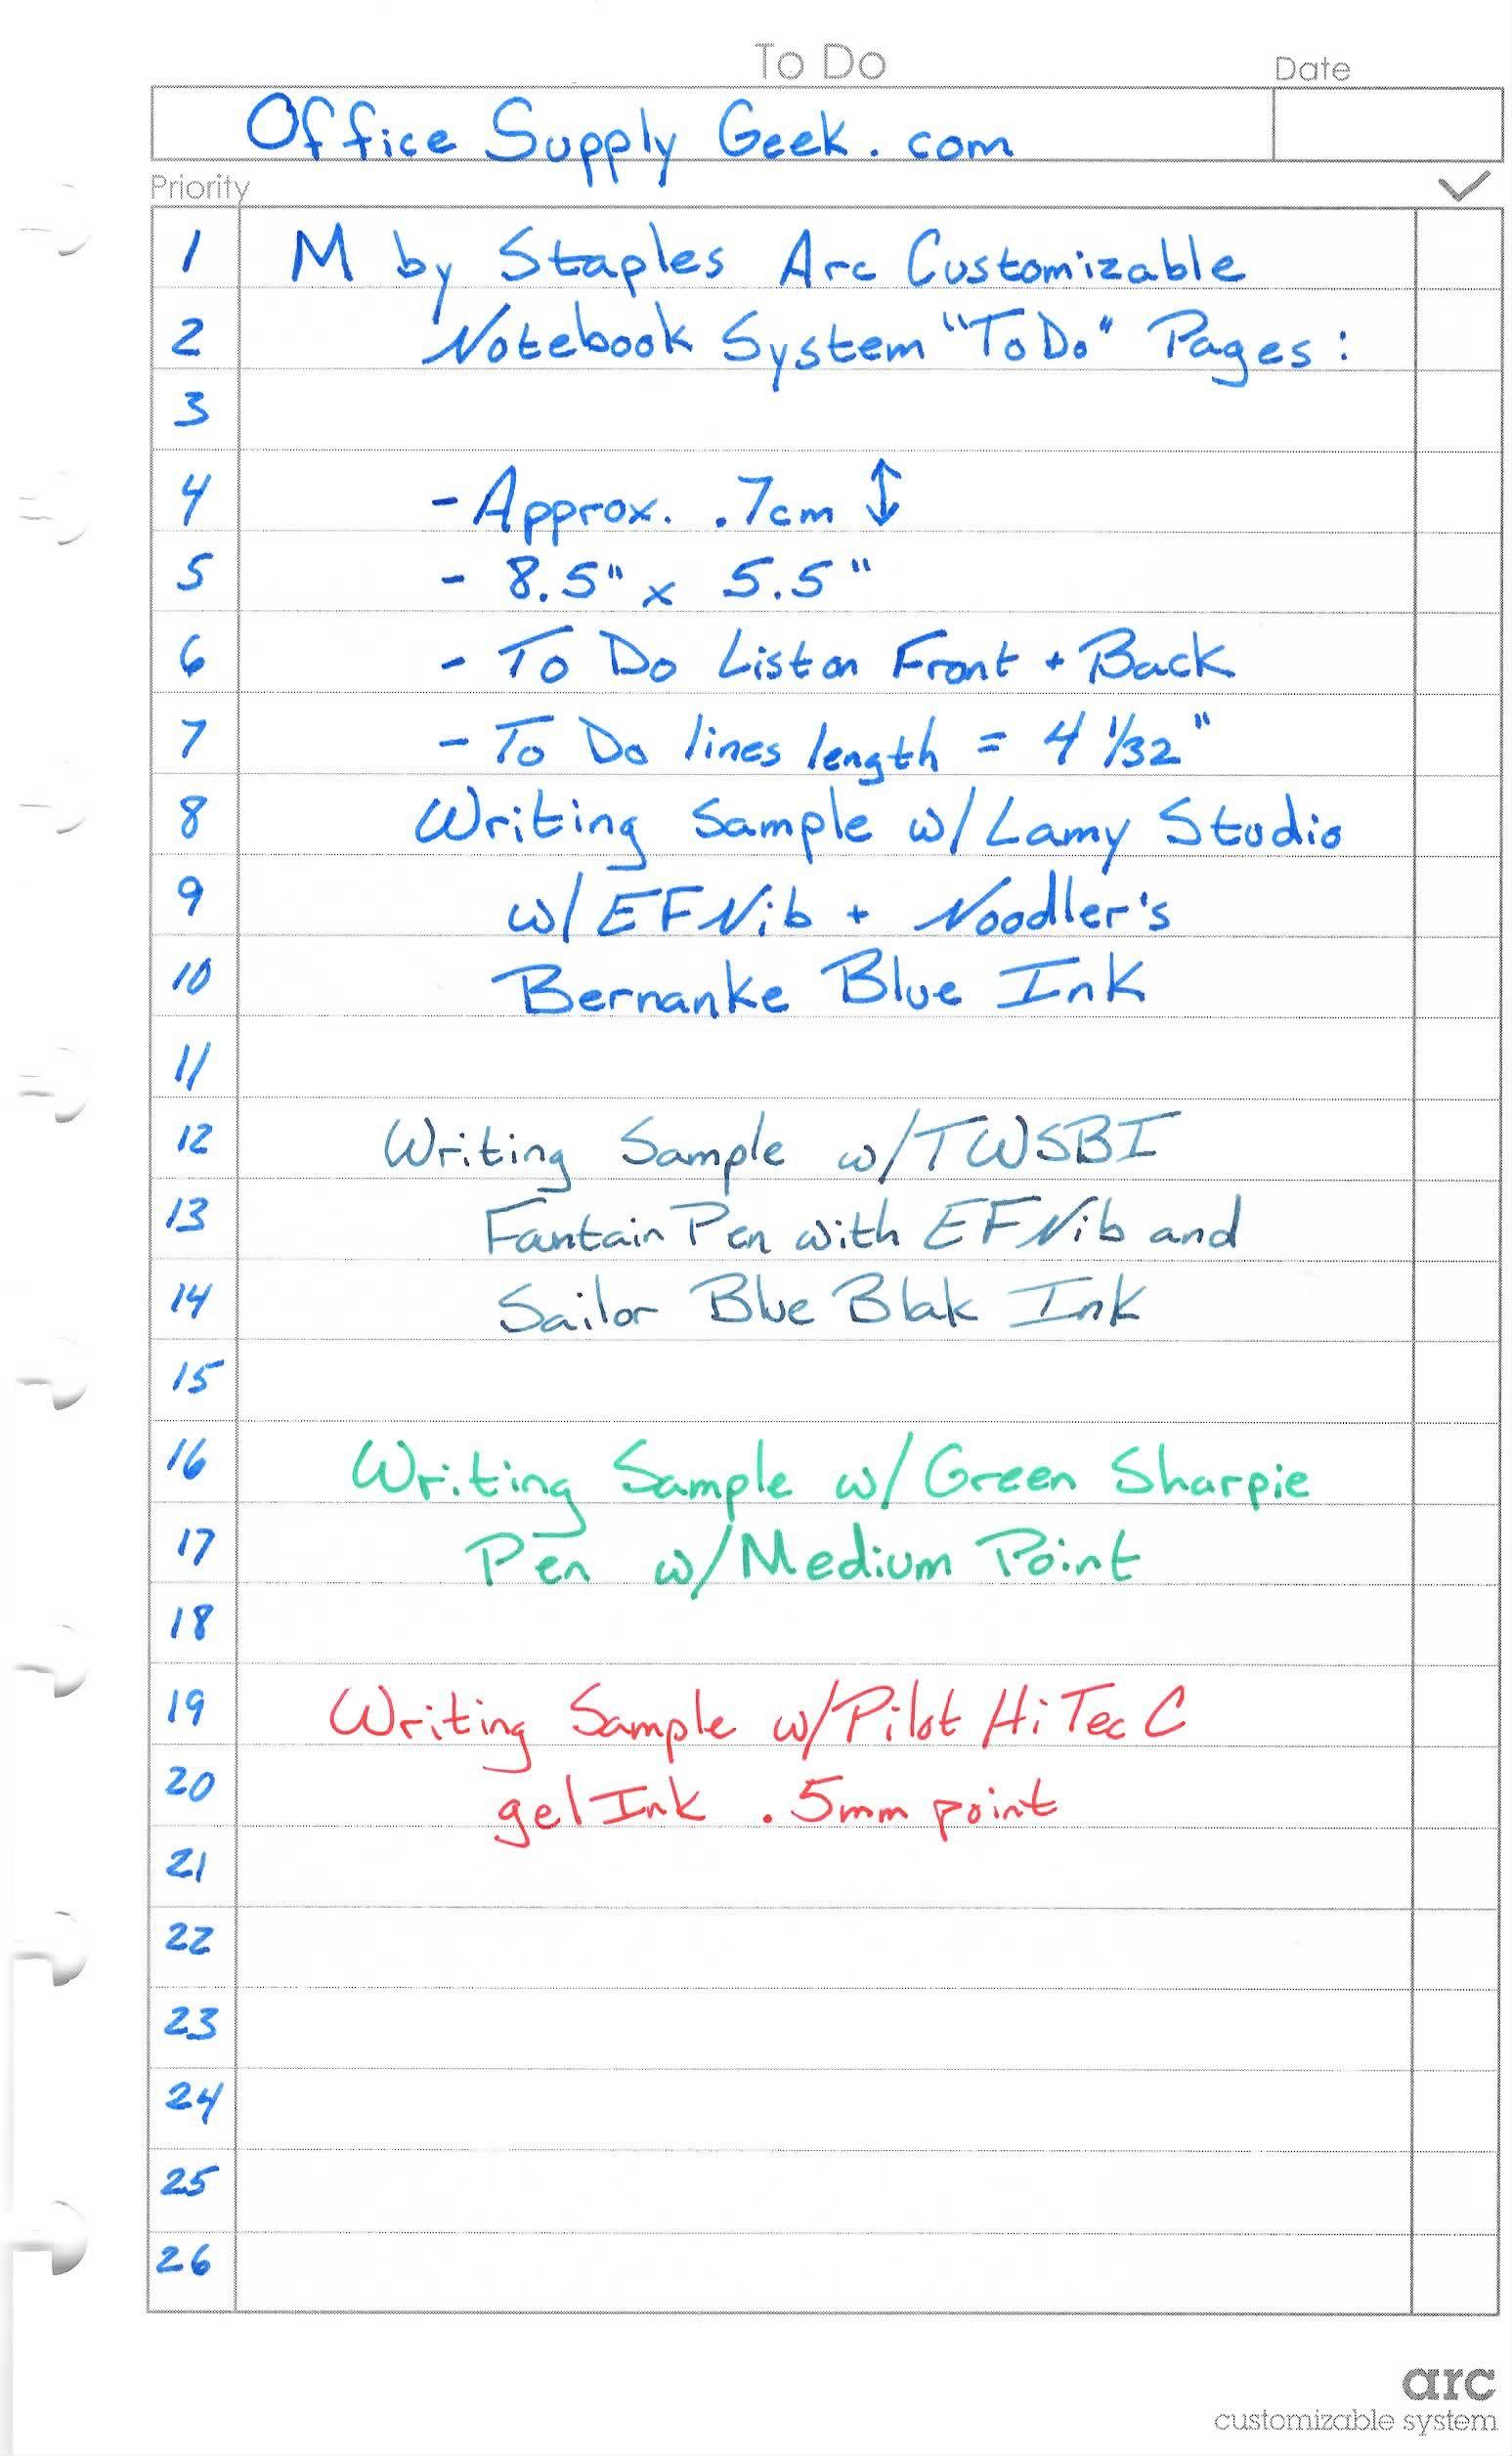 staples arc system to do list writing sample organization